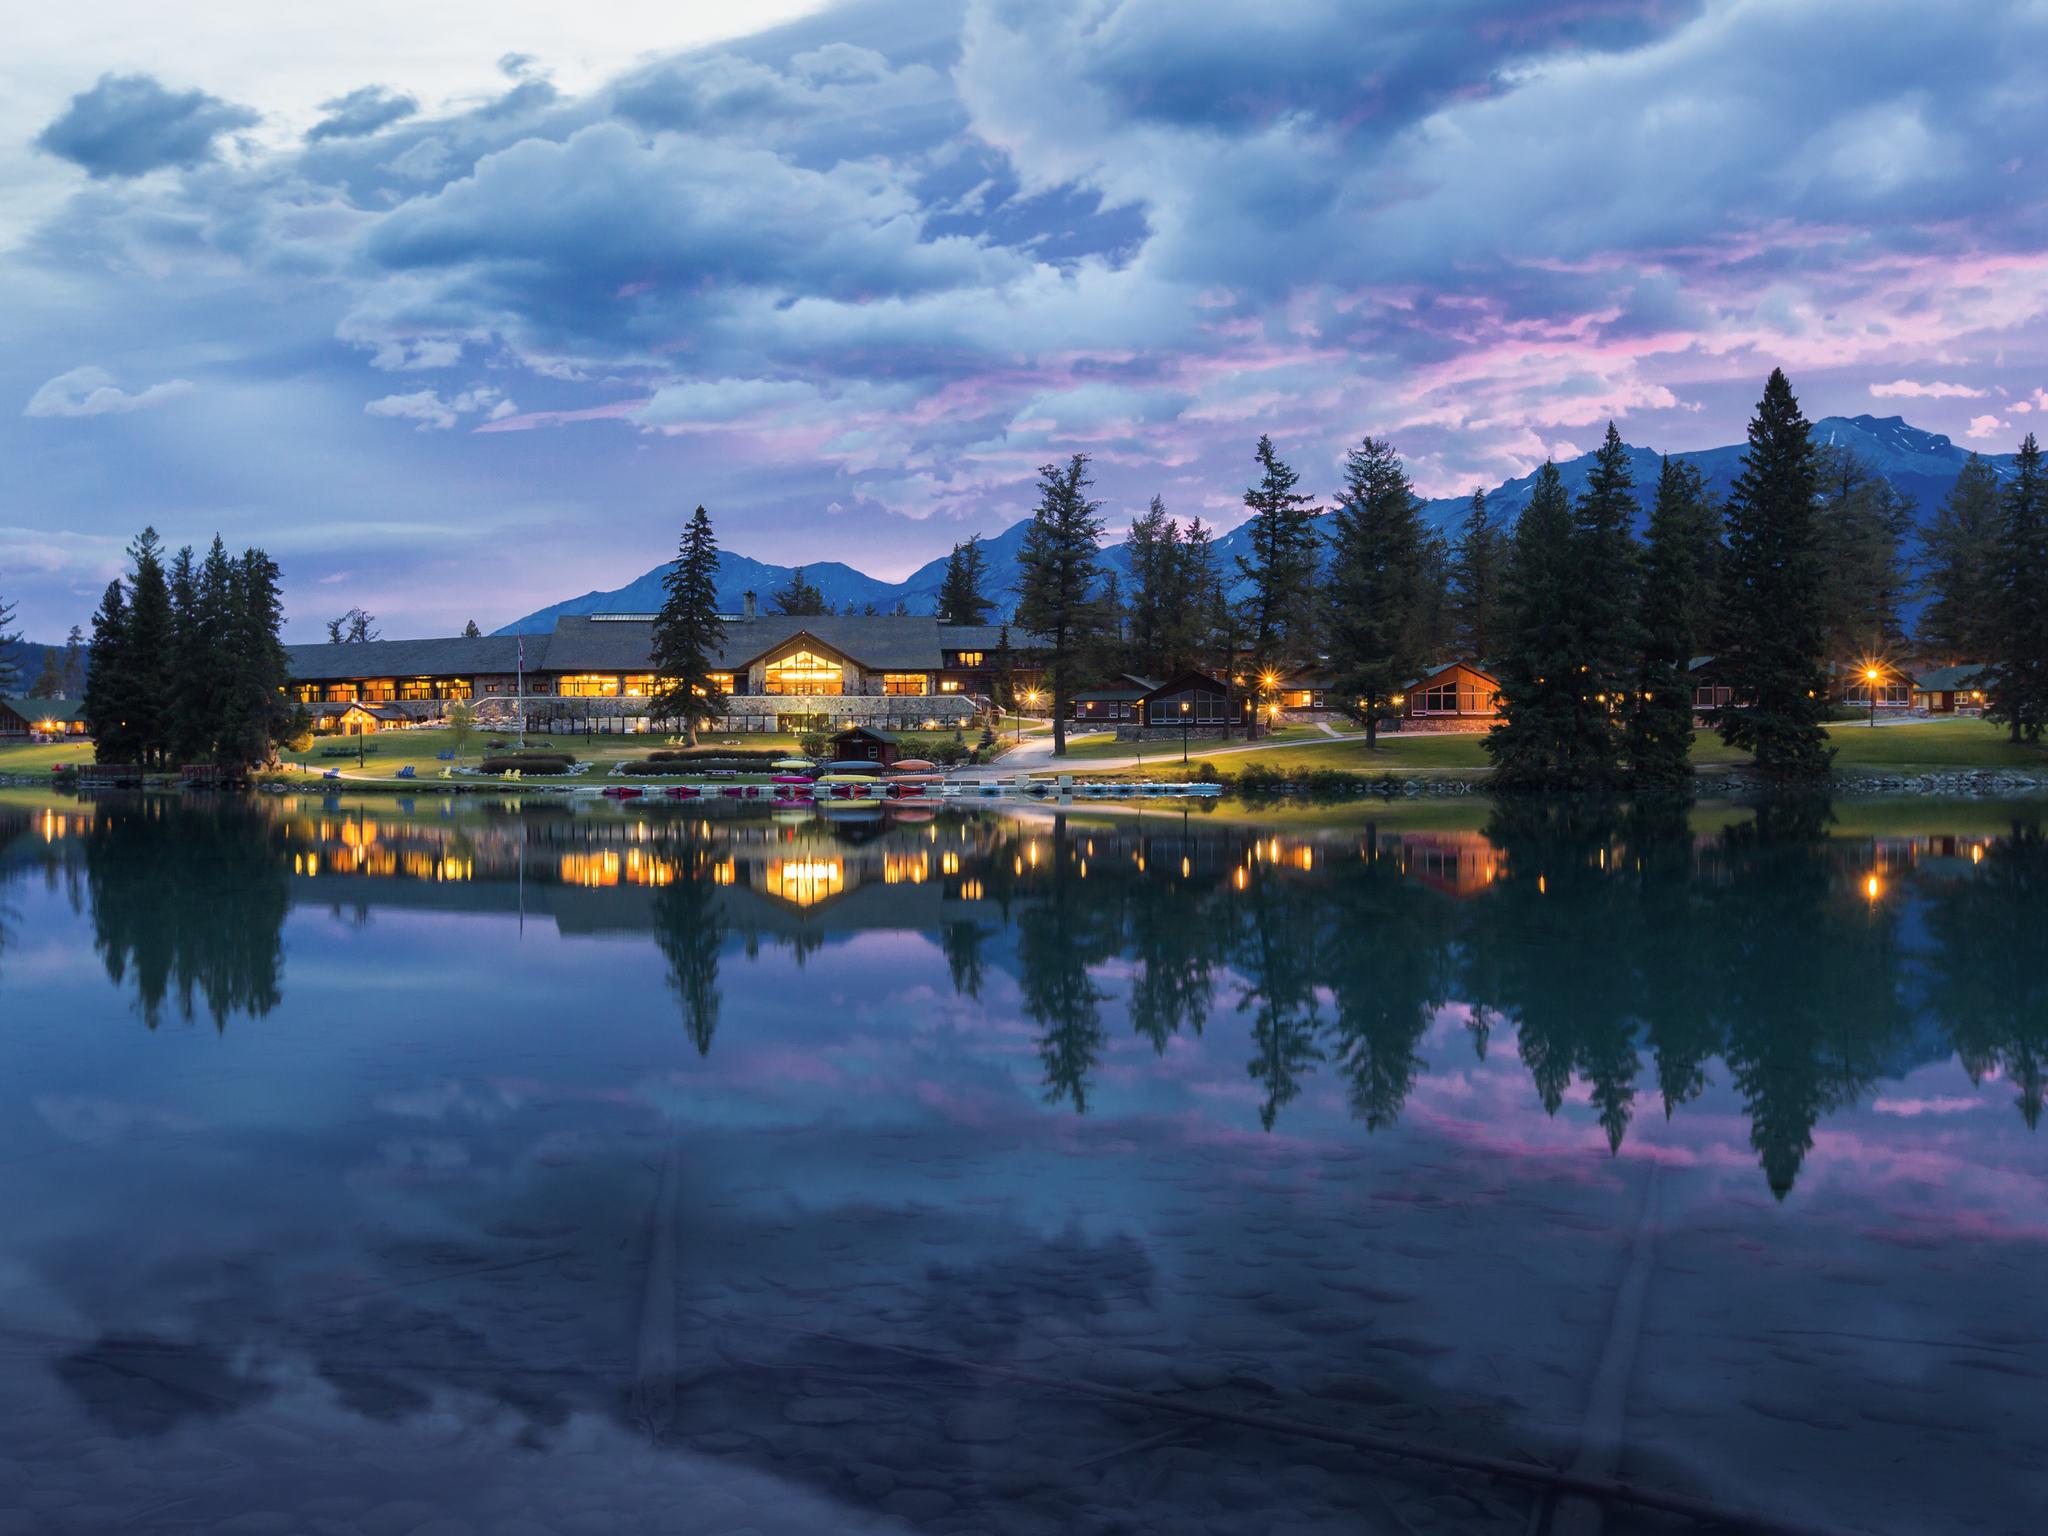 酒店 – Fairmont Jasper Park Lodge 酒店